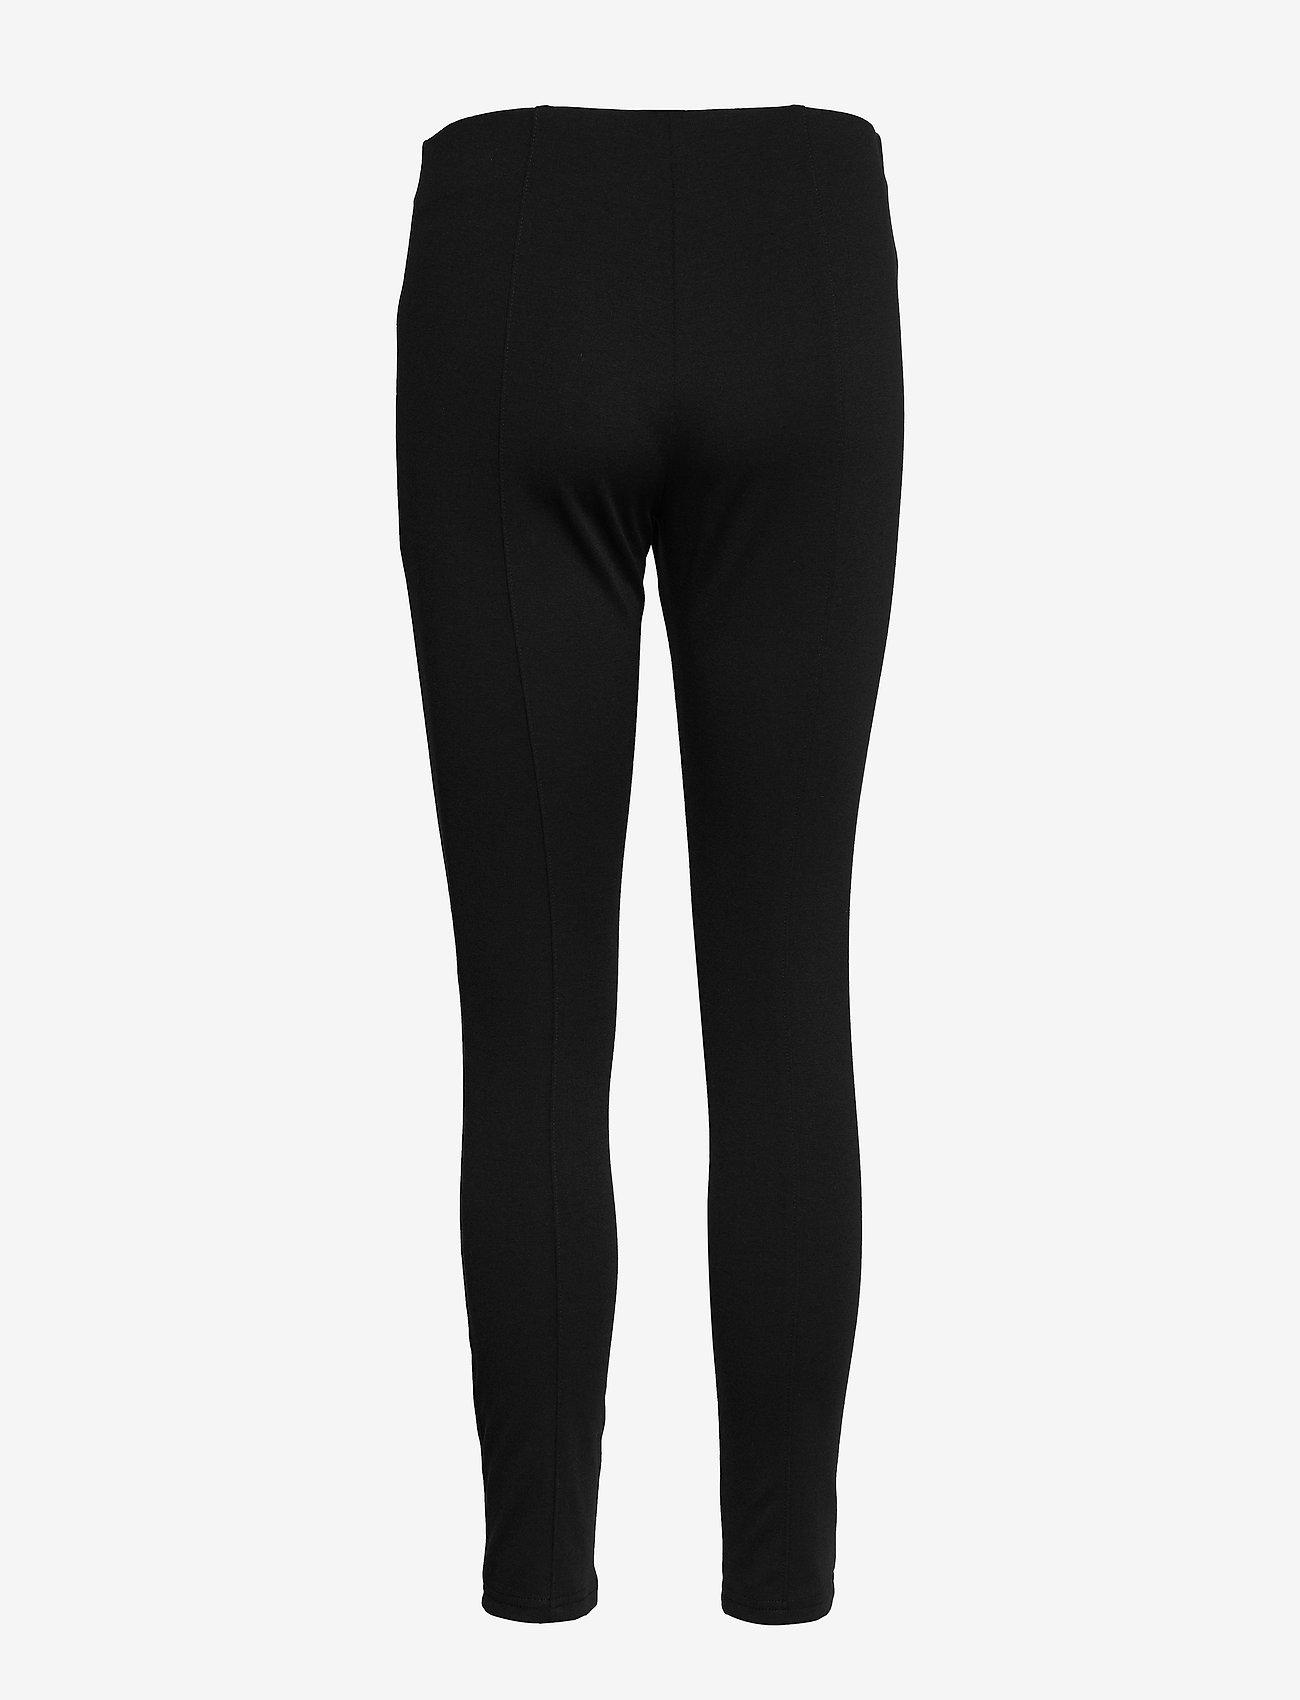 Ihkate Trend Pa (Black) (245 kr) - ICHI crVXeUna